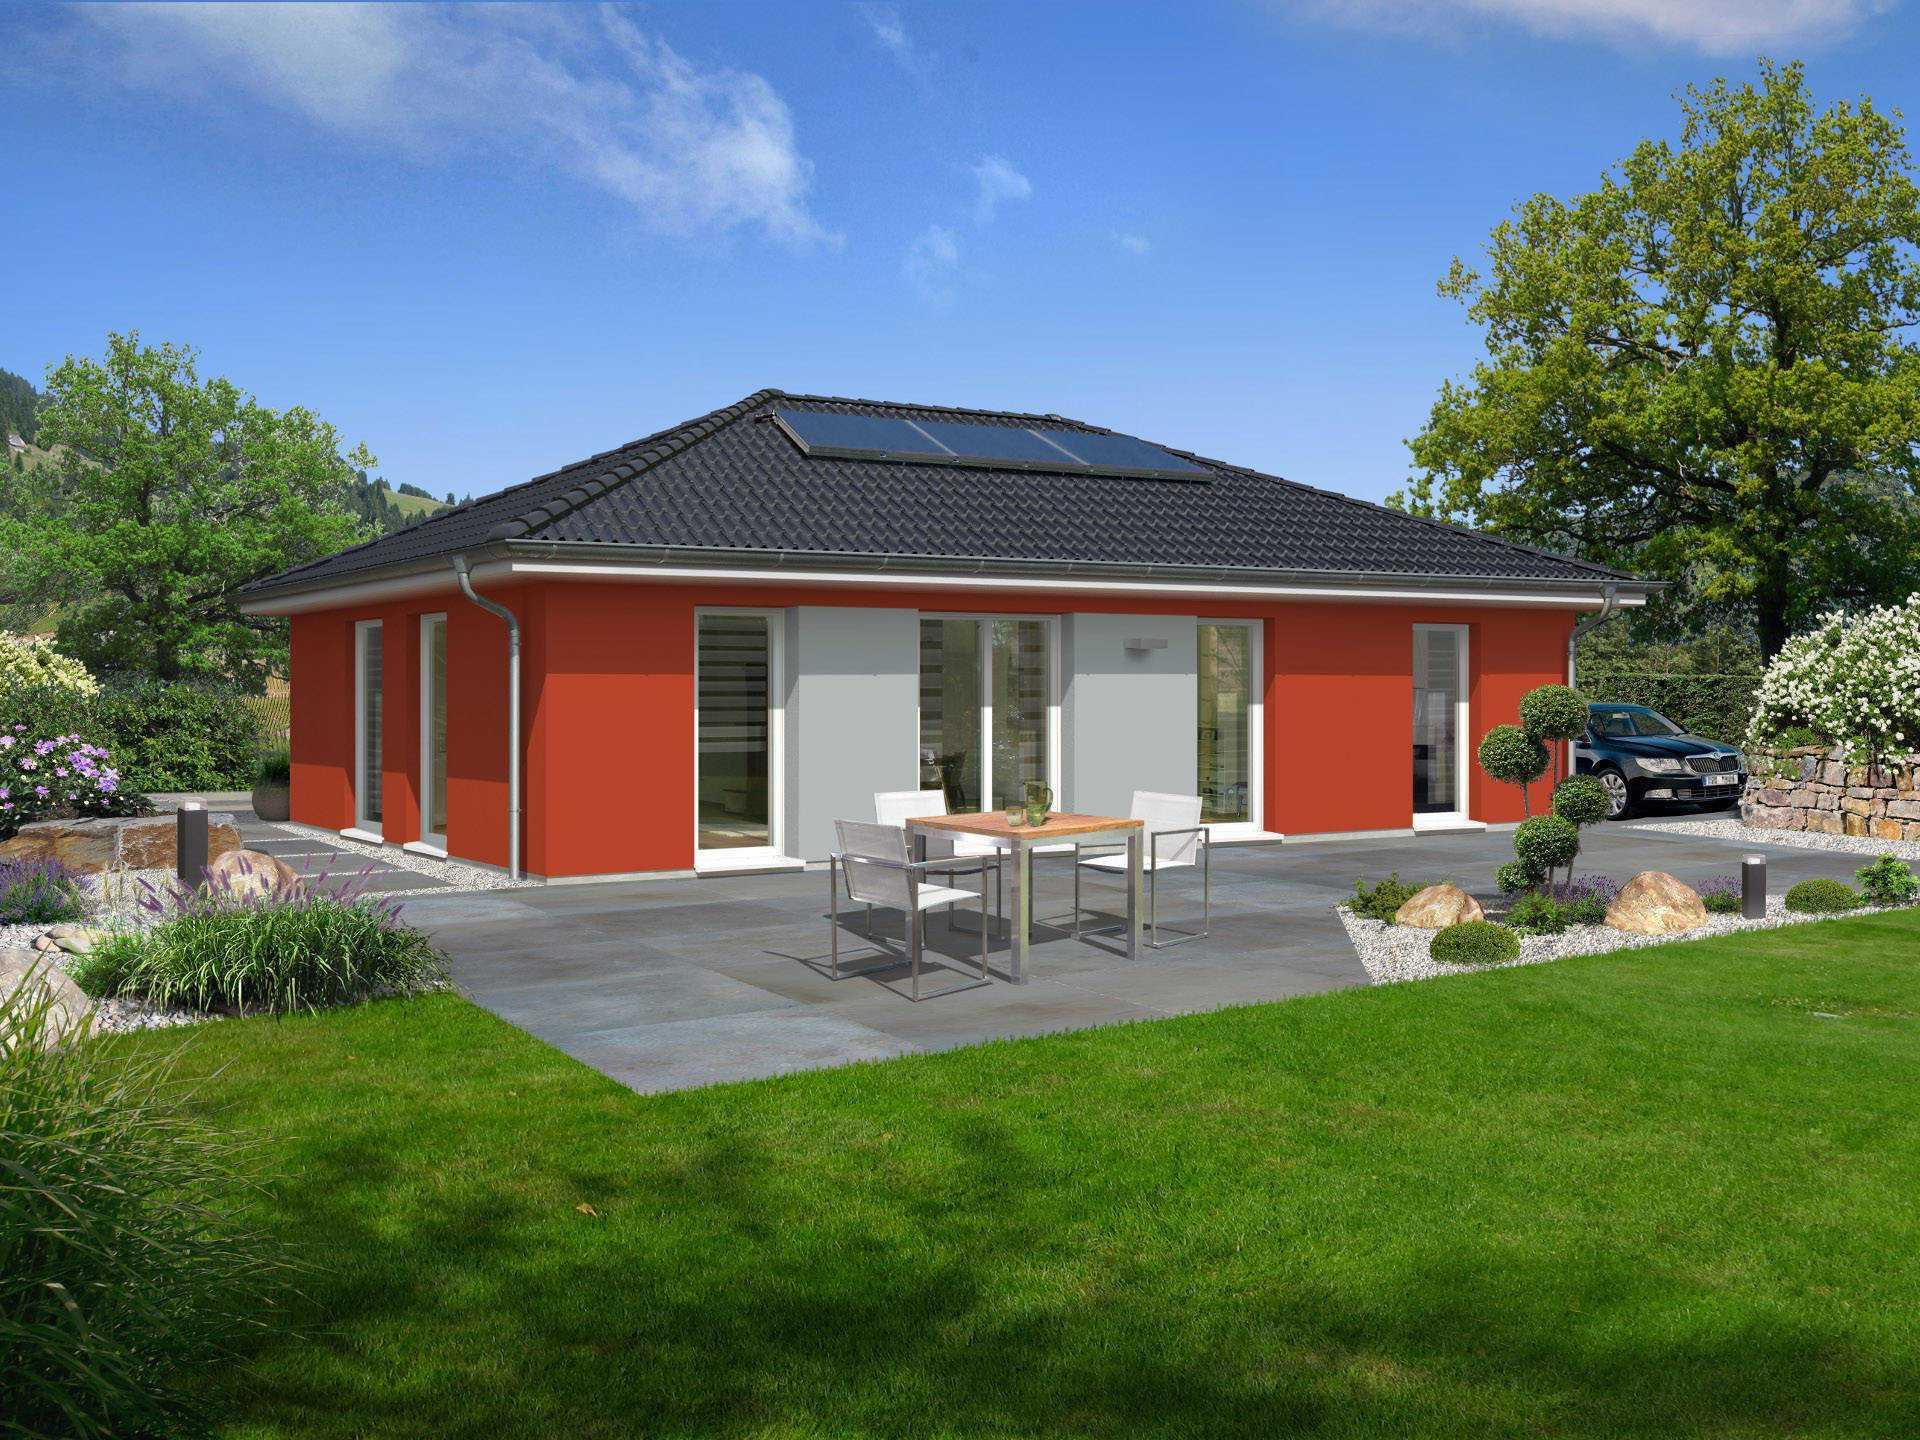 massivhaus bungalow 110 anke brietzke town country. Black Bedroom Furniture Sets. Home Design Ideas